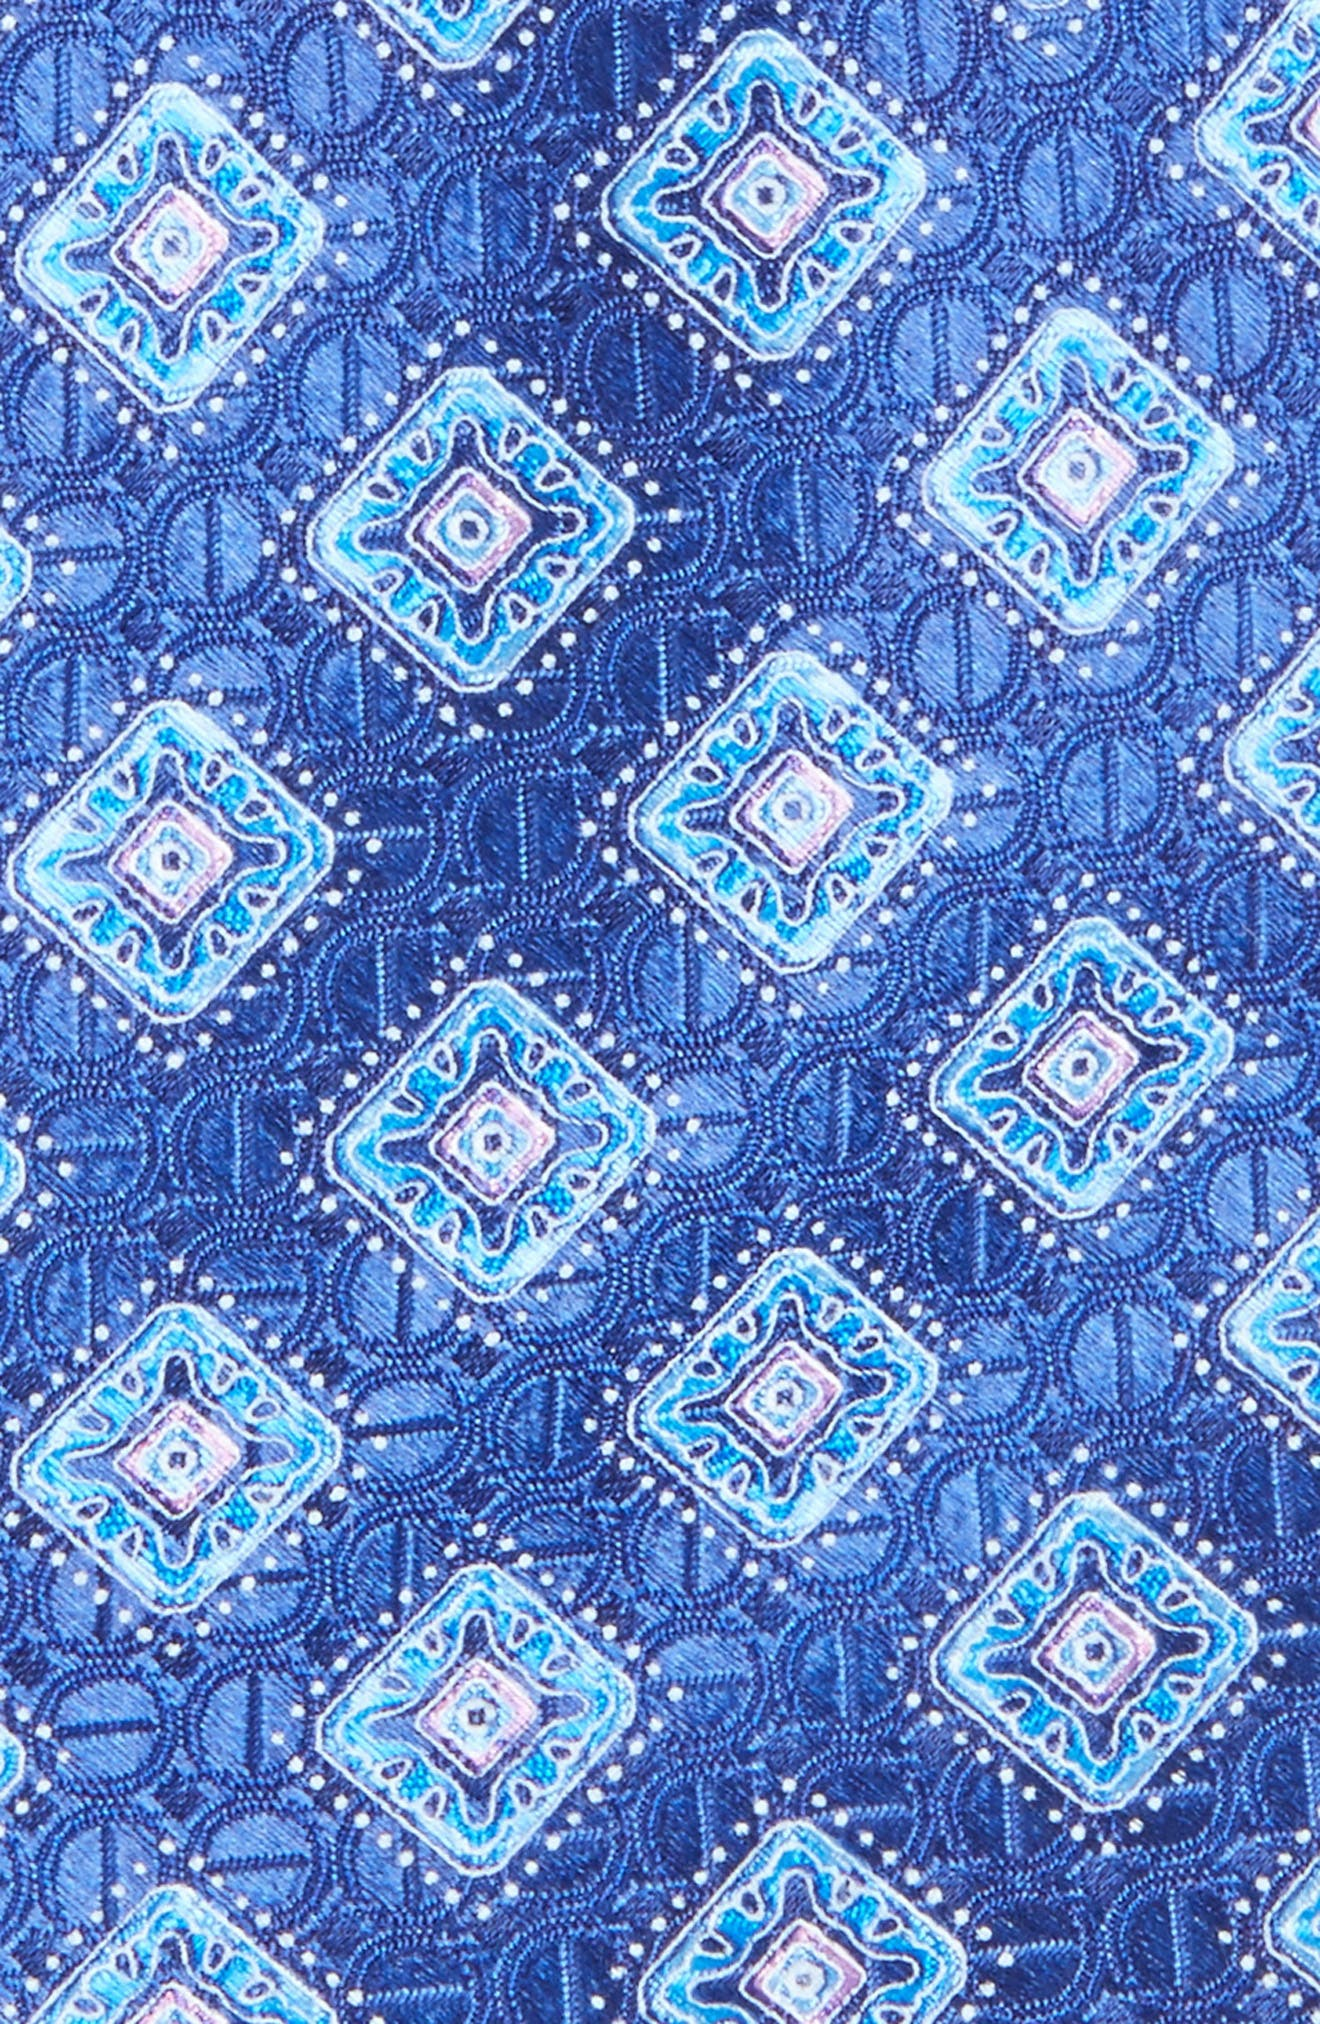 Sanders Neat Silk Tie,                             Alternate thumbnail 2, color,                             Navy